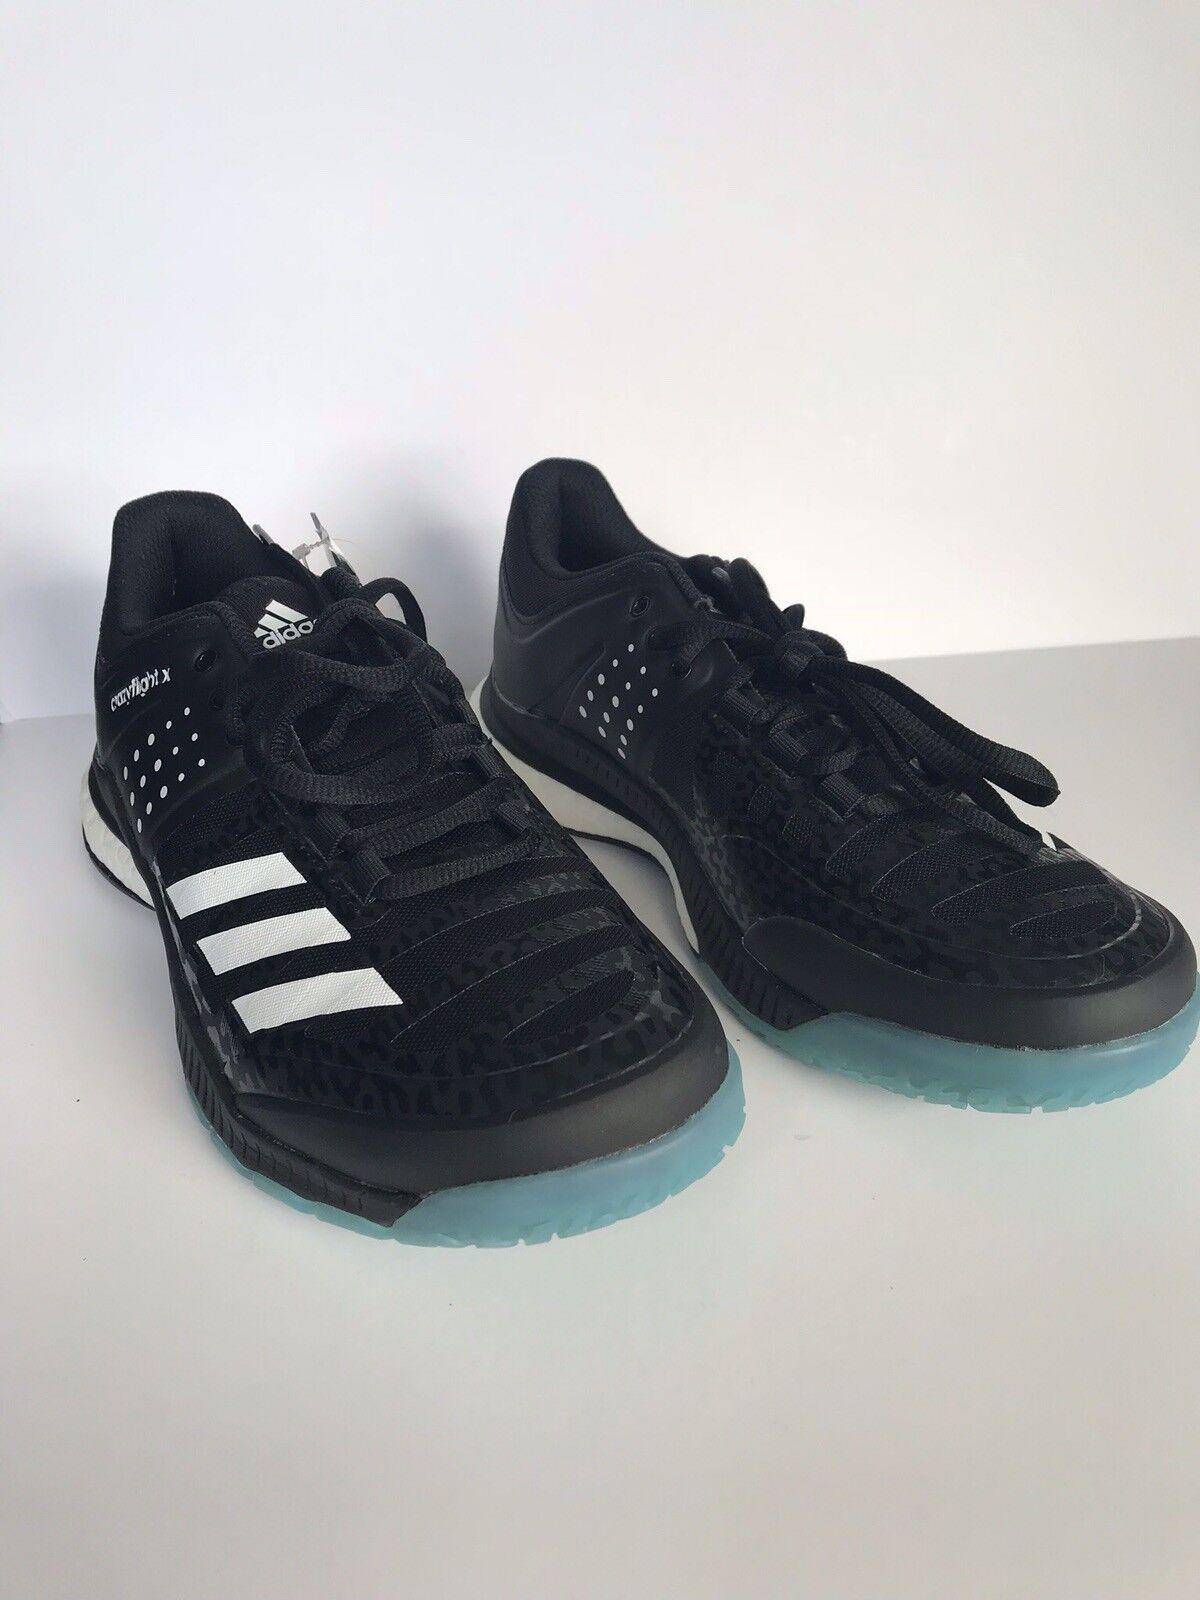 Adidas Crazyfly X  W scarpe - Wouomo Volleyball SKU BA9269 nero Dimensione 7  autentico online